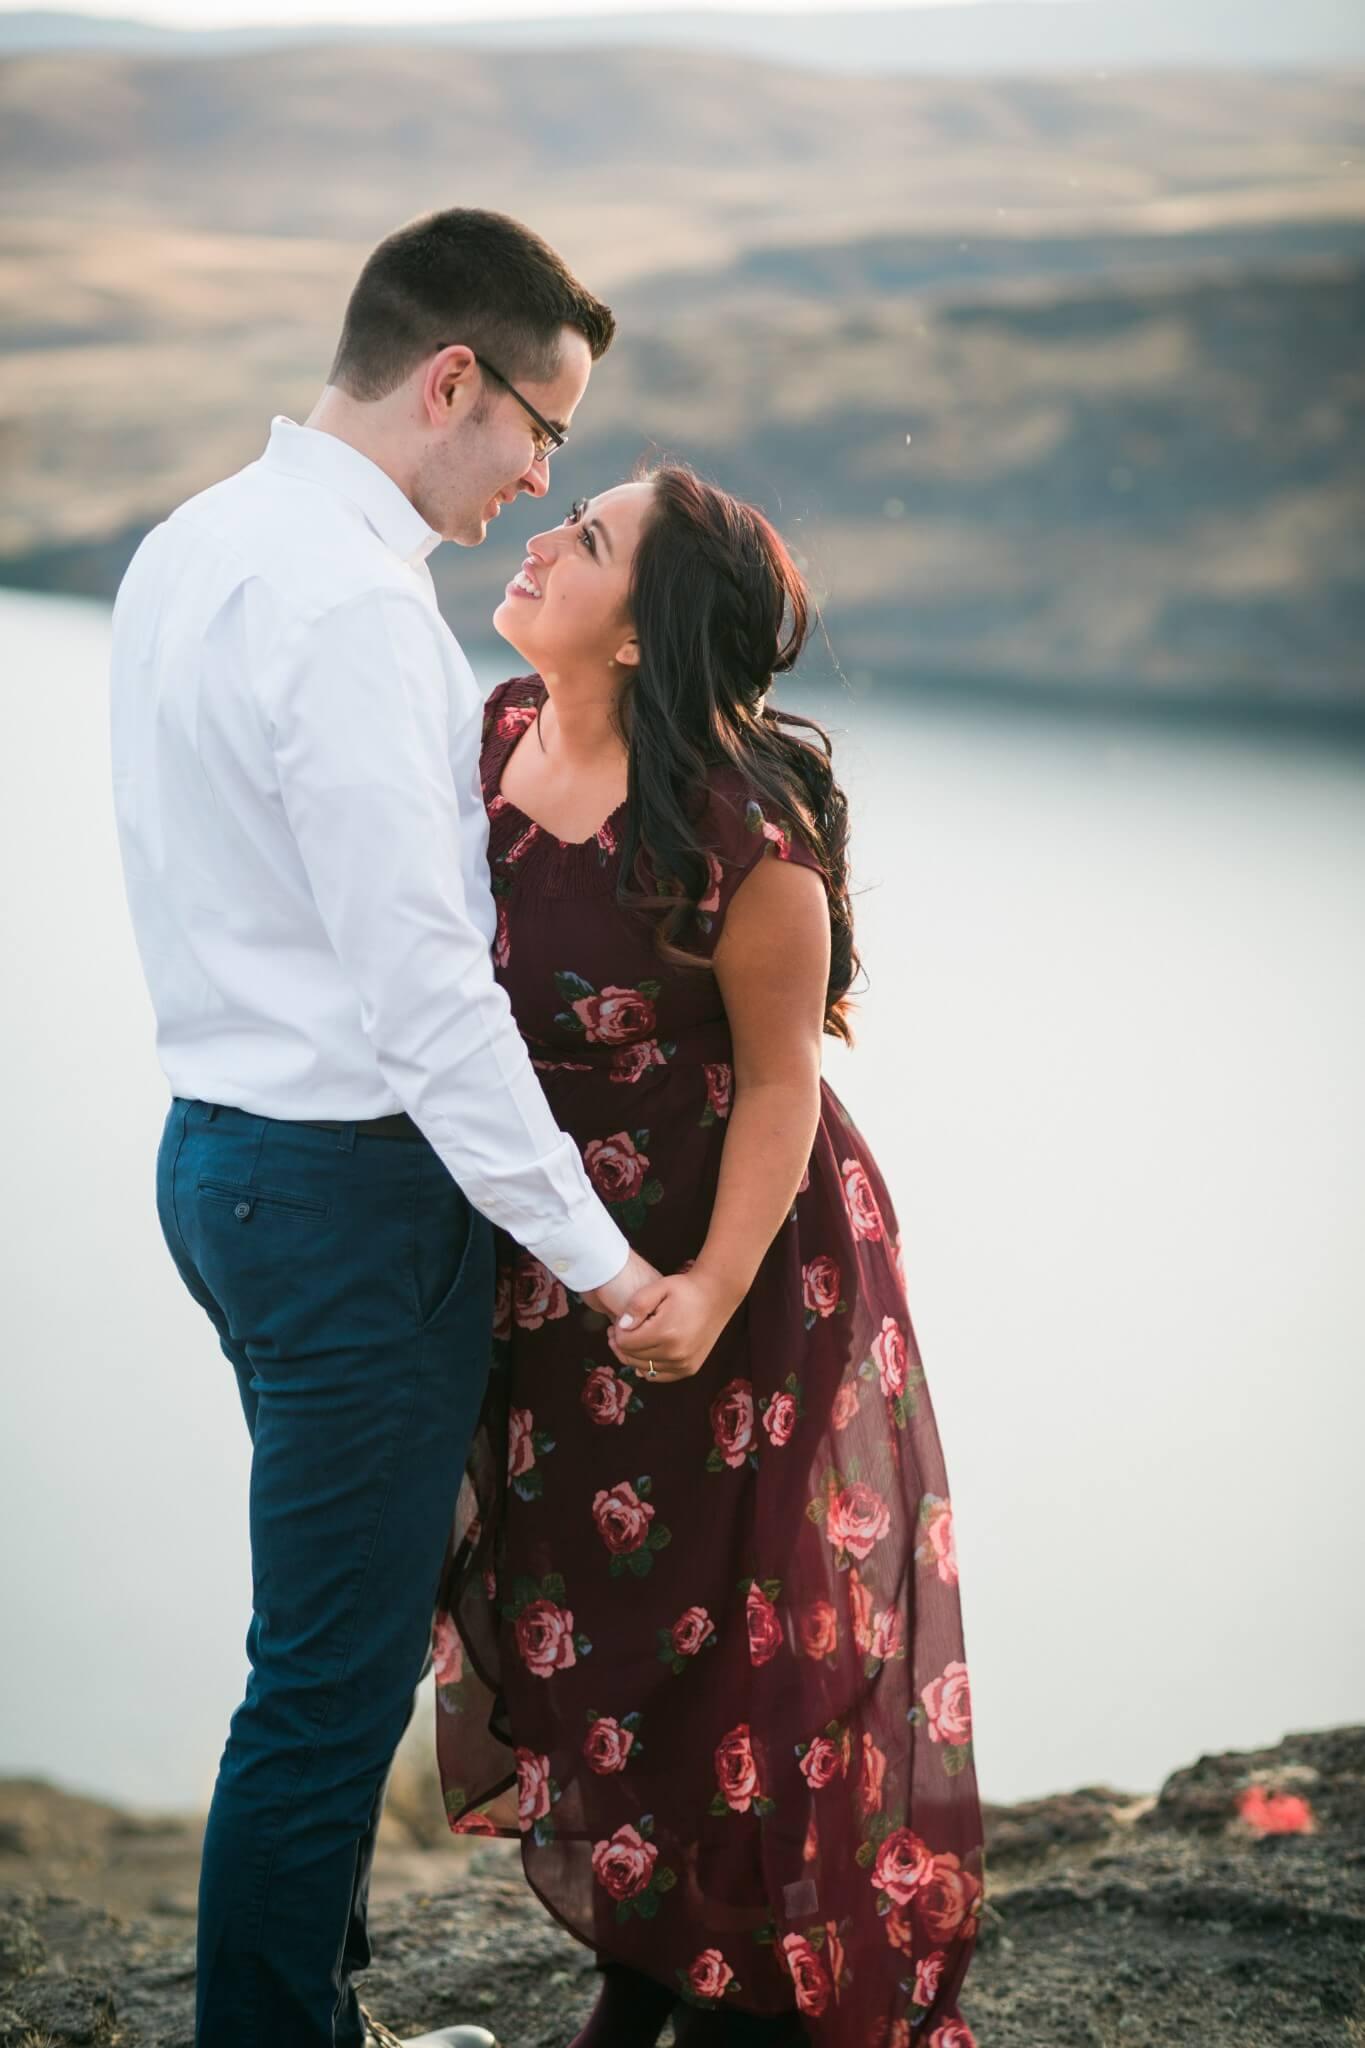 Lesly & Michael Vantage Engagement by Bill Weisgerber Spokane Photographer (41 of 71).jpg